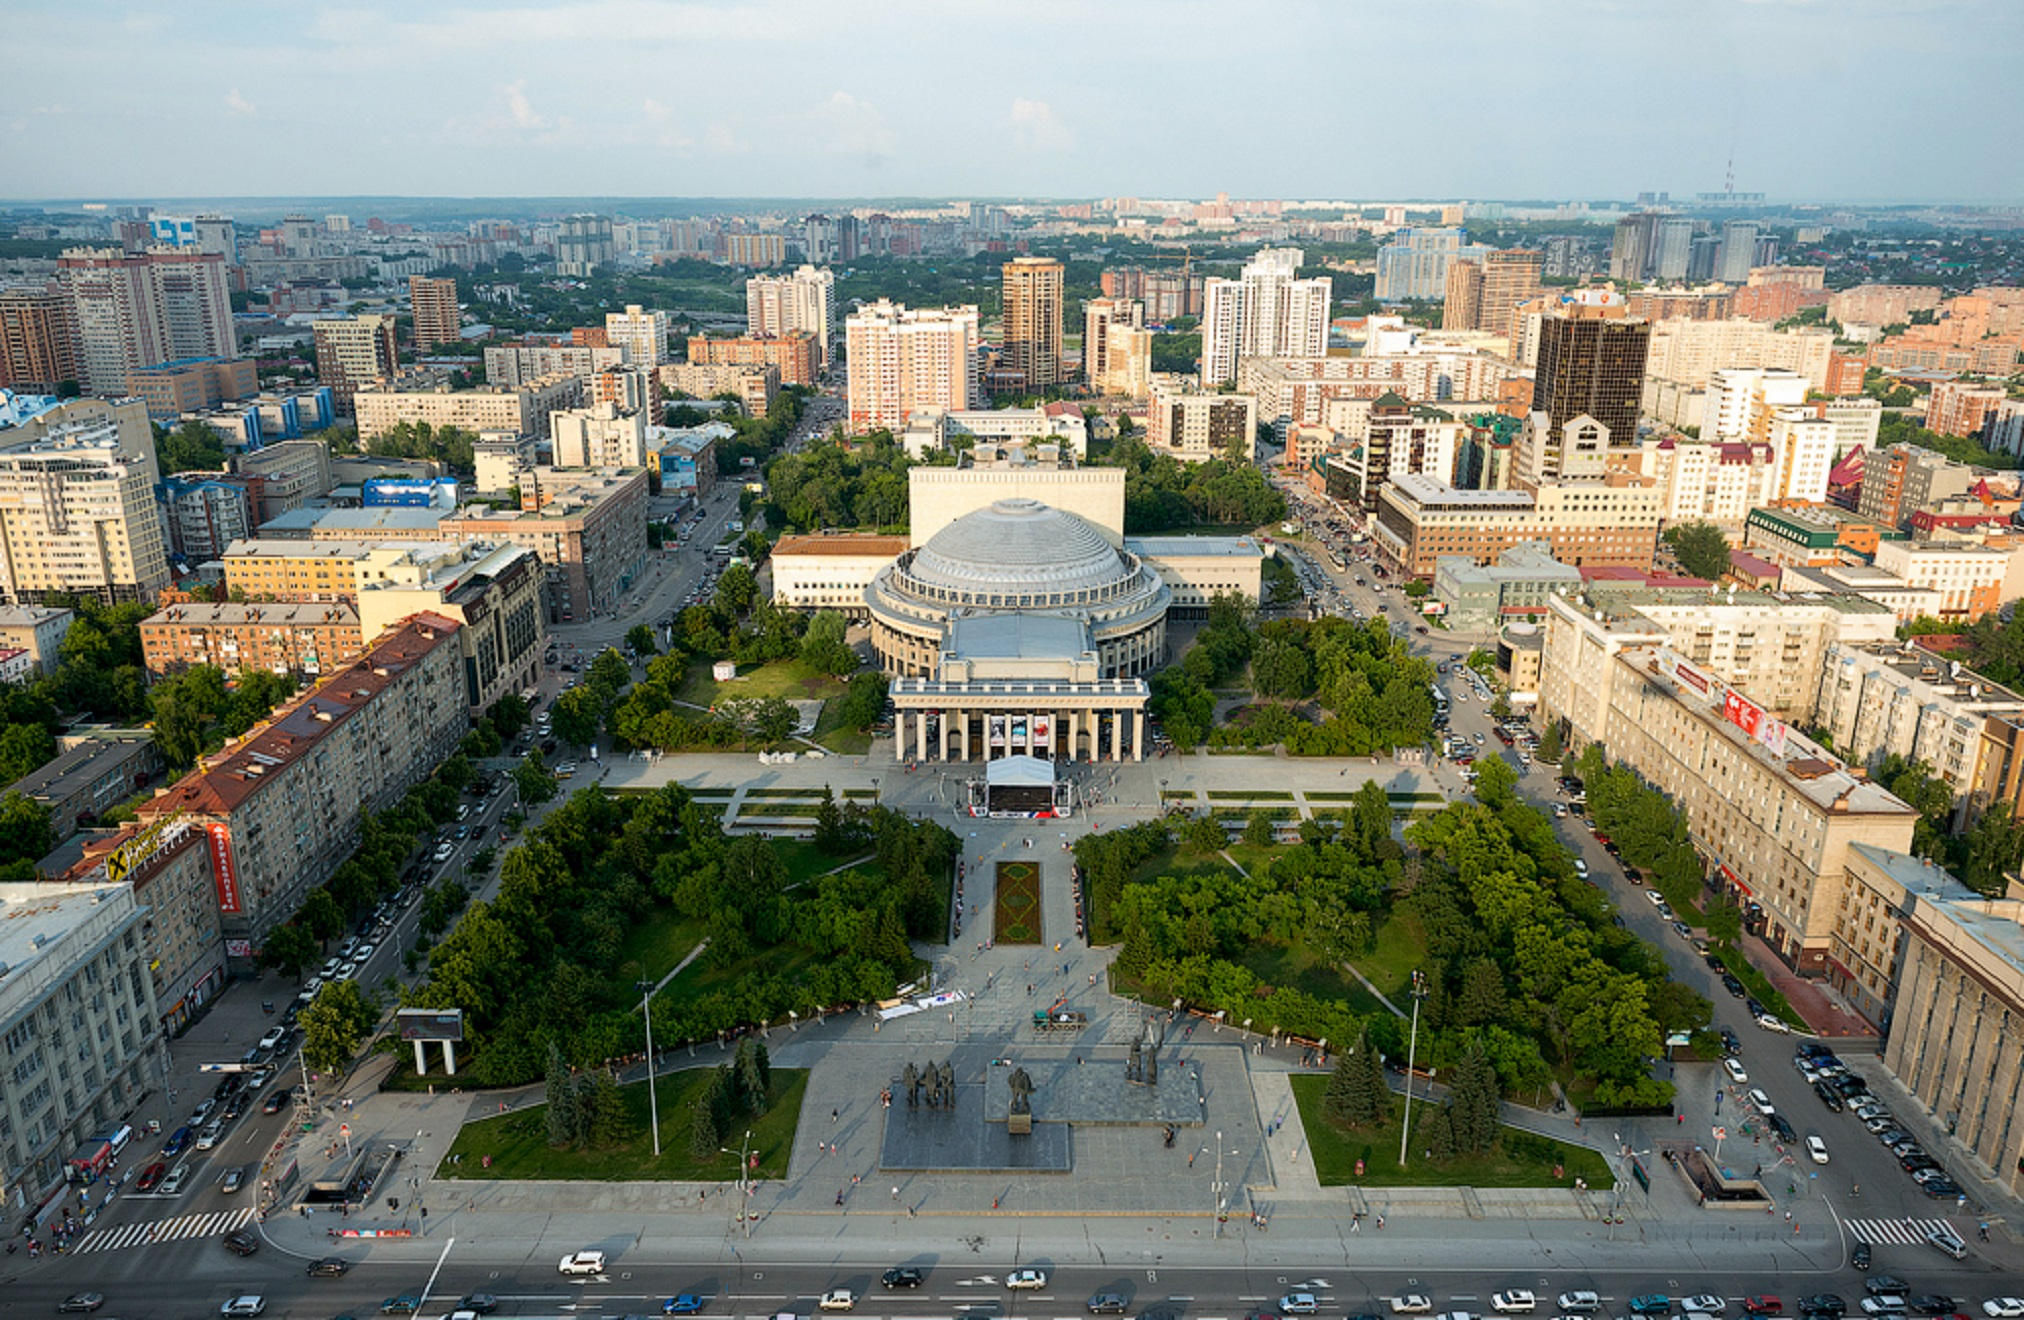 09 - Sibéria capital